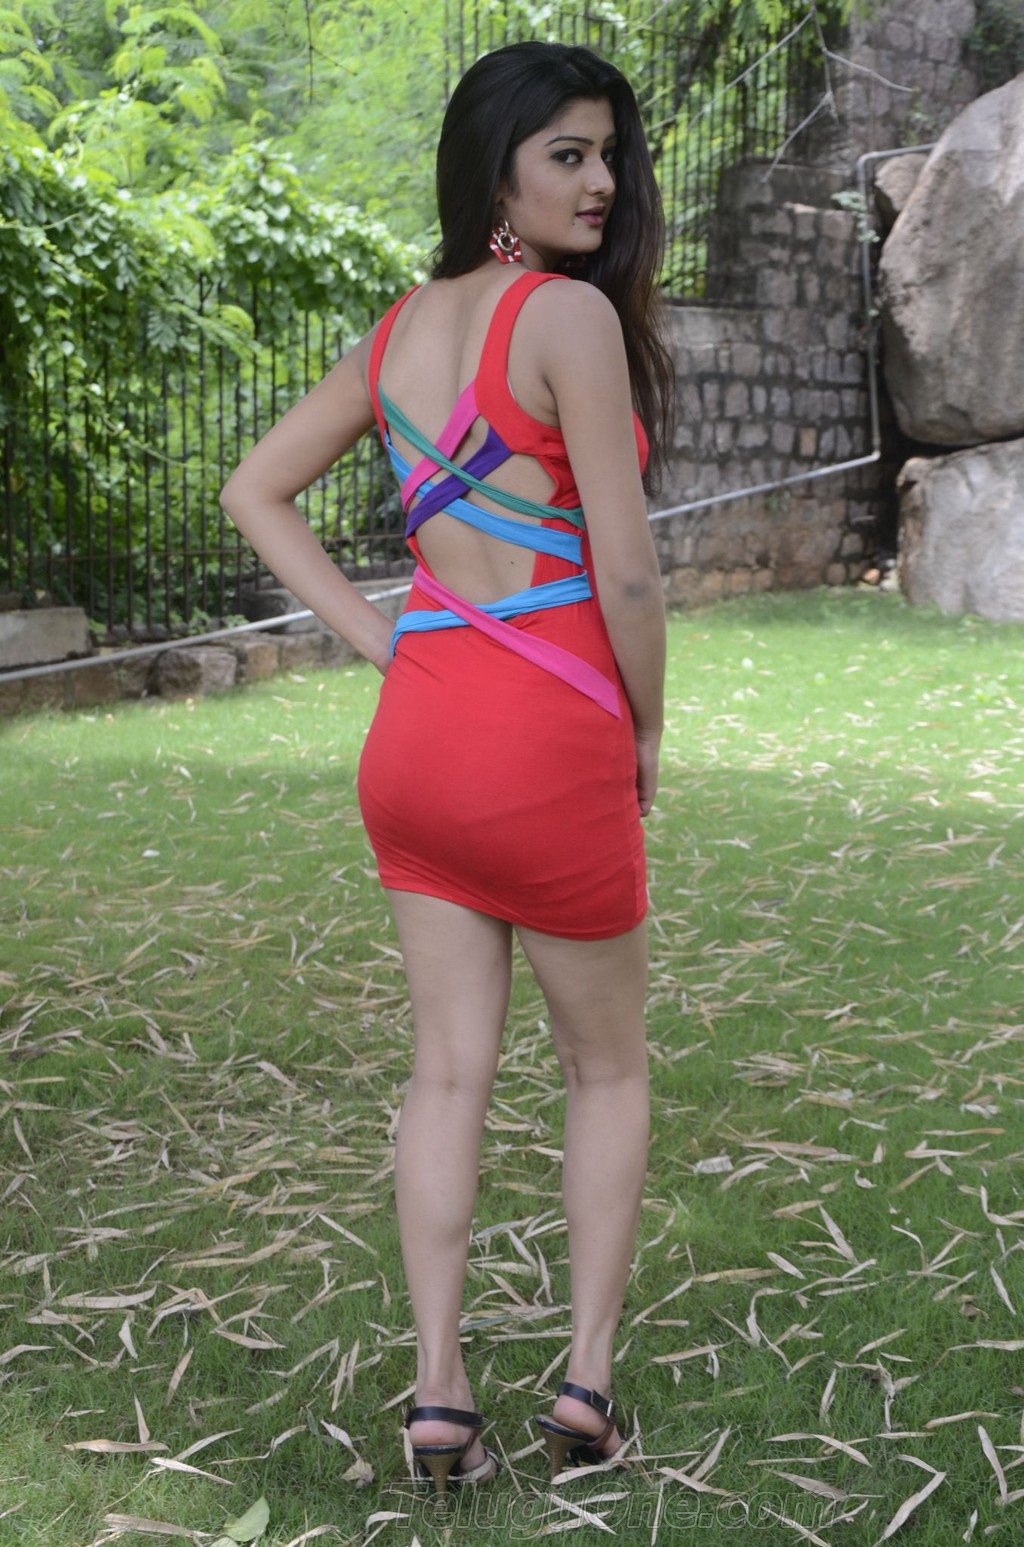 Actress Celebrities Photos Actress Poojitha Spicy Thigh -6828